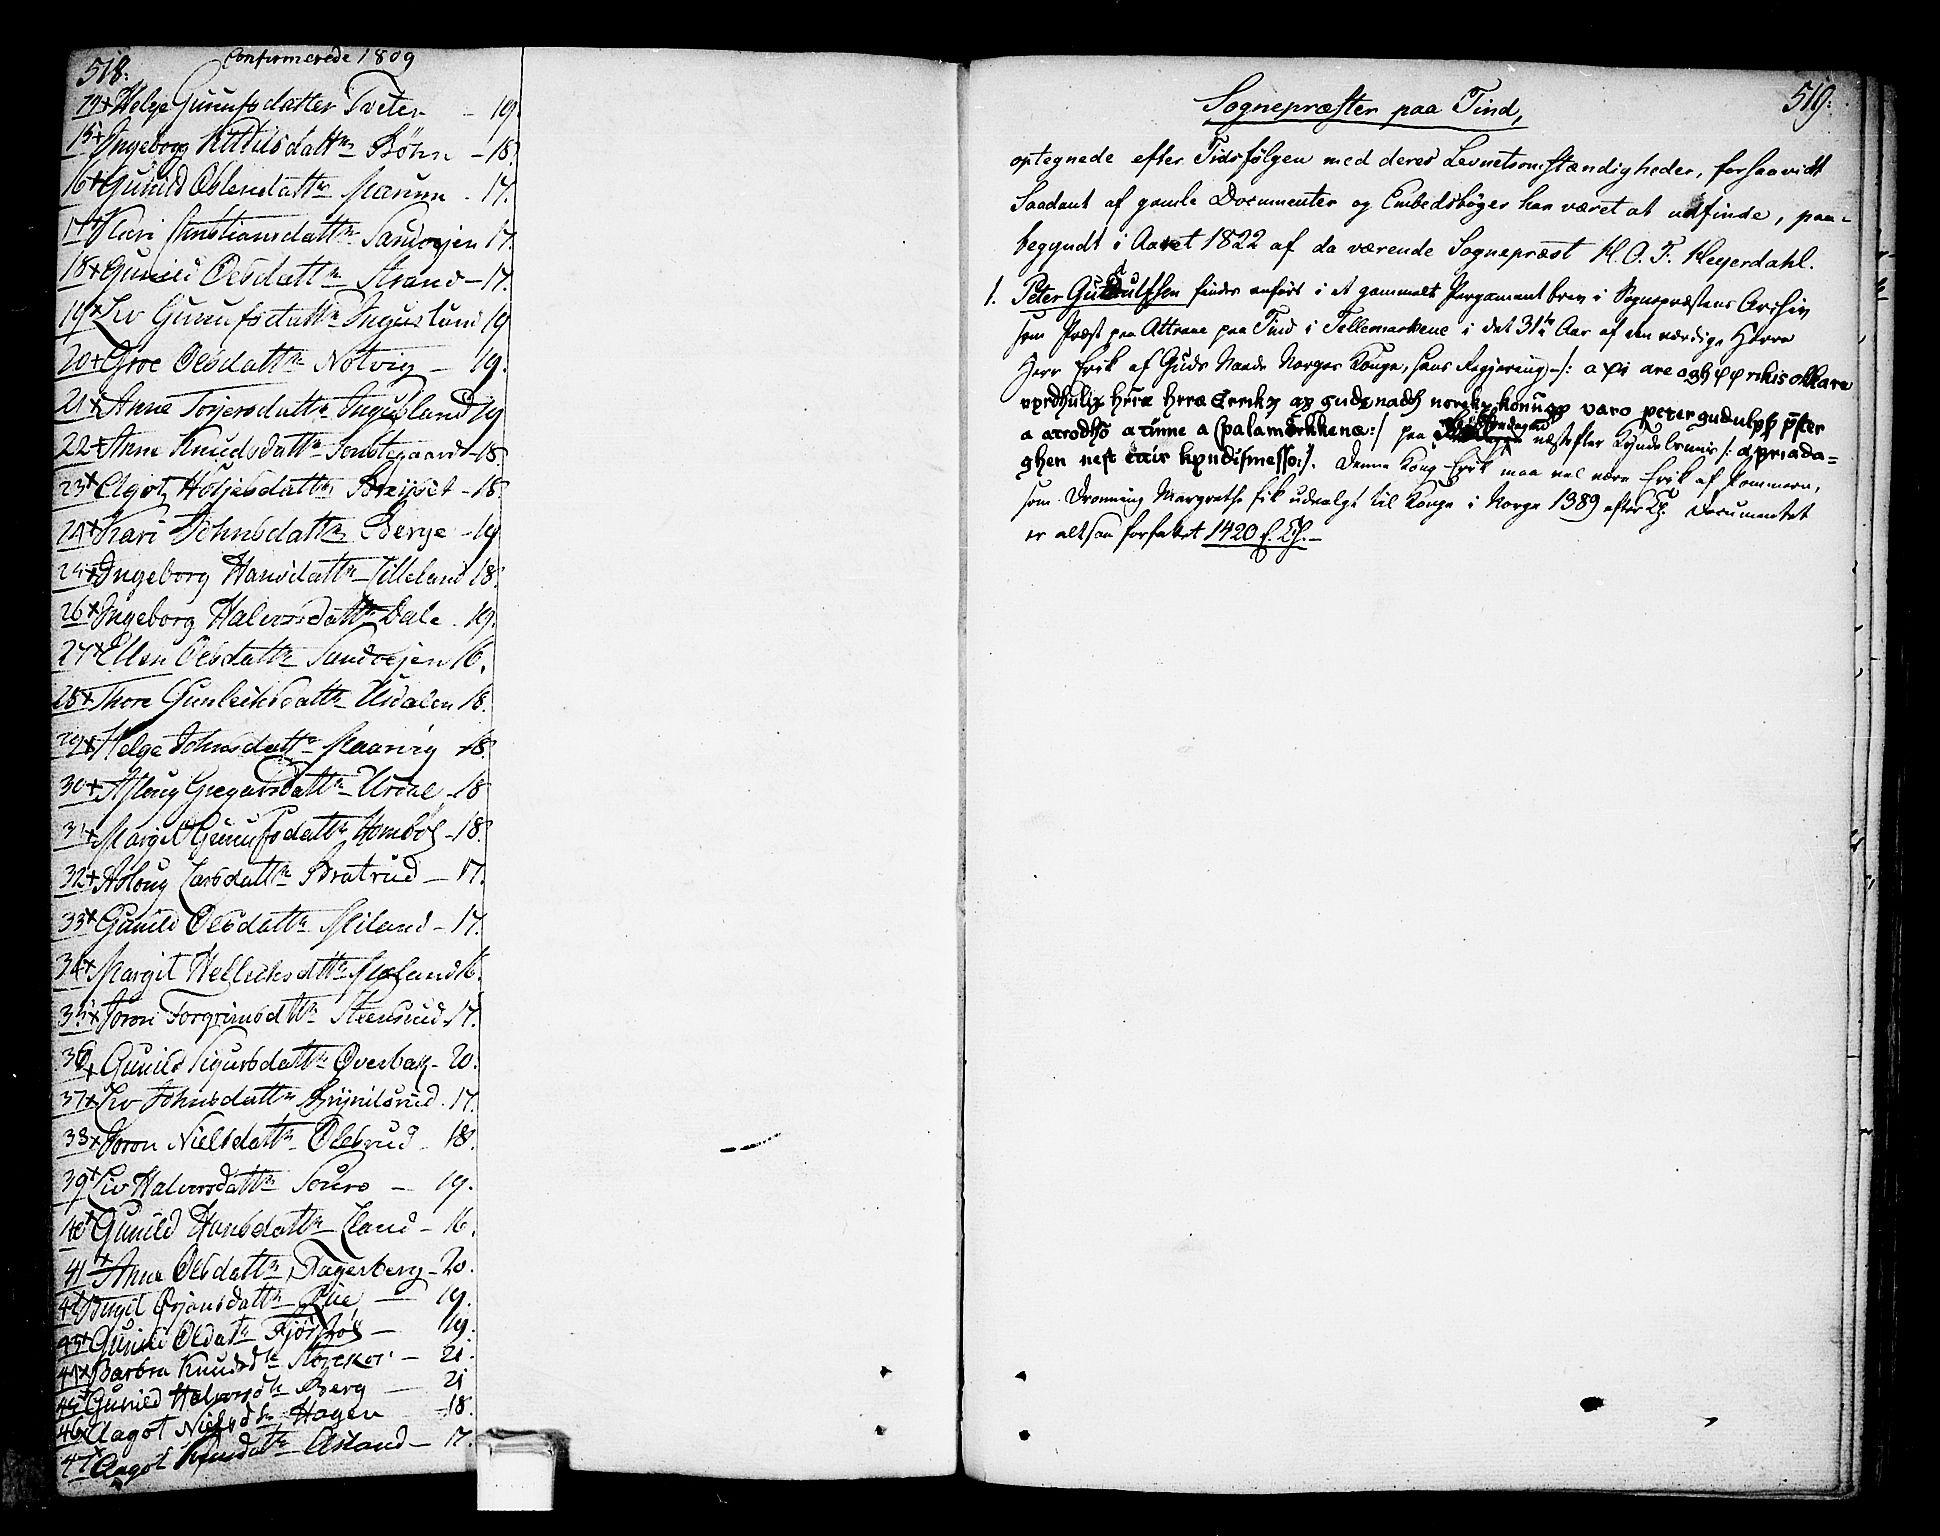 SAKO, Tinn kirkebøker, F/Fa/L0002: Ministerialbok nr. I 2, 1757-1810, s. 518-519